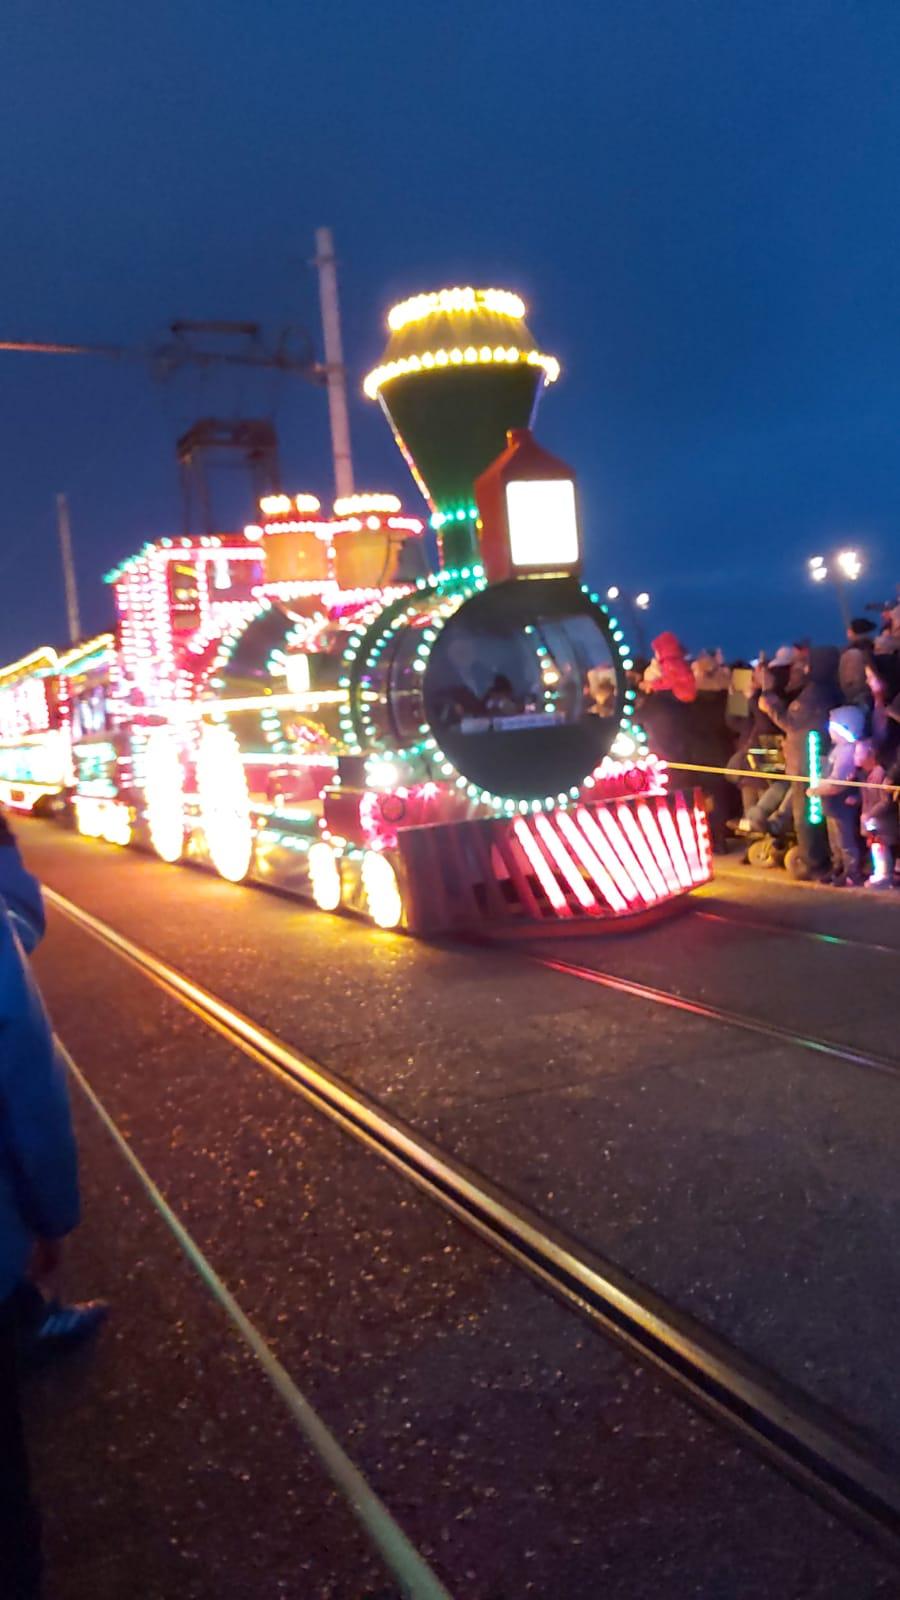 lit up tram